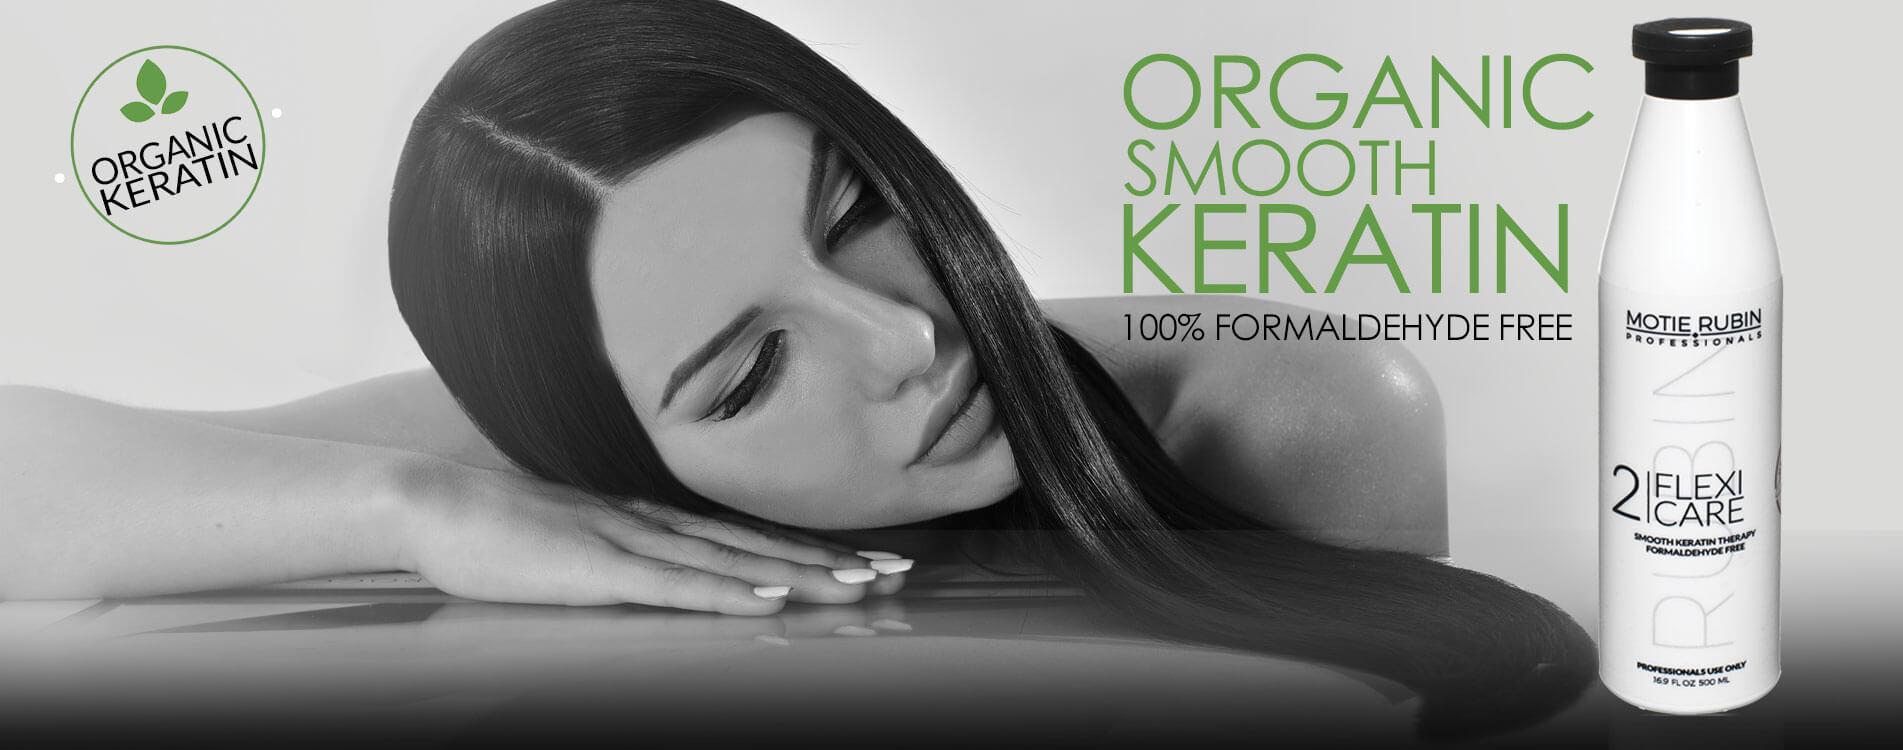 organic smooth keratin